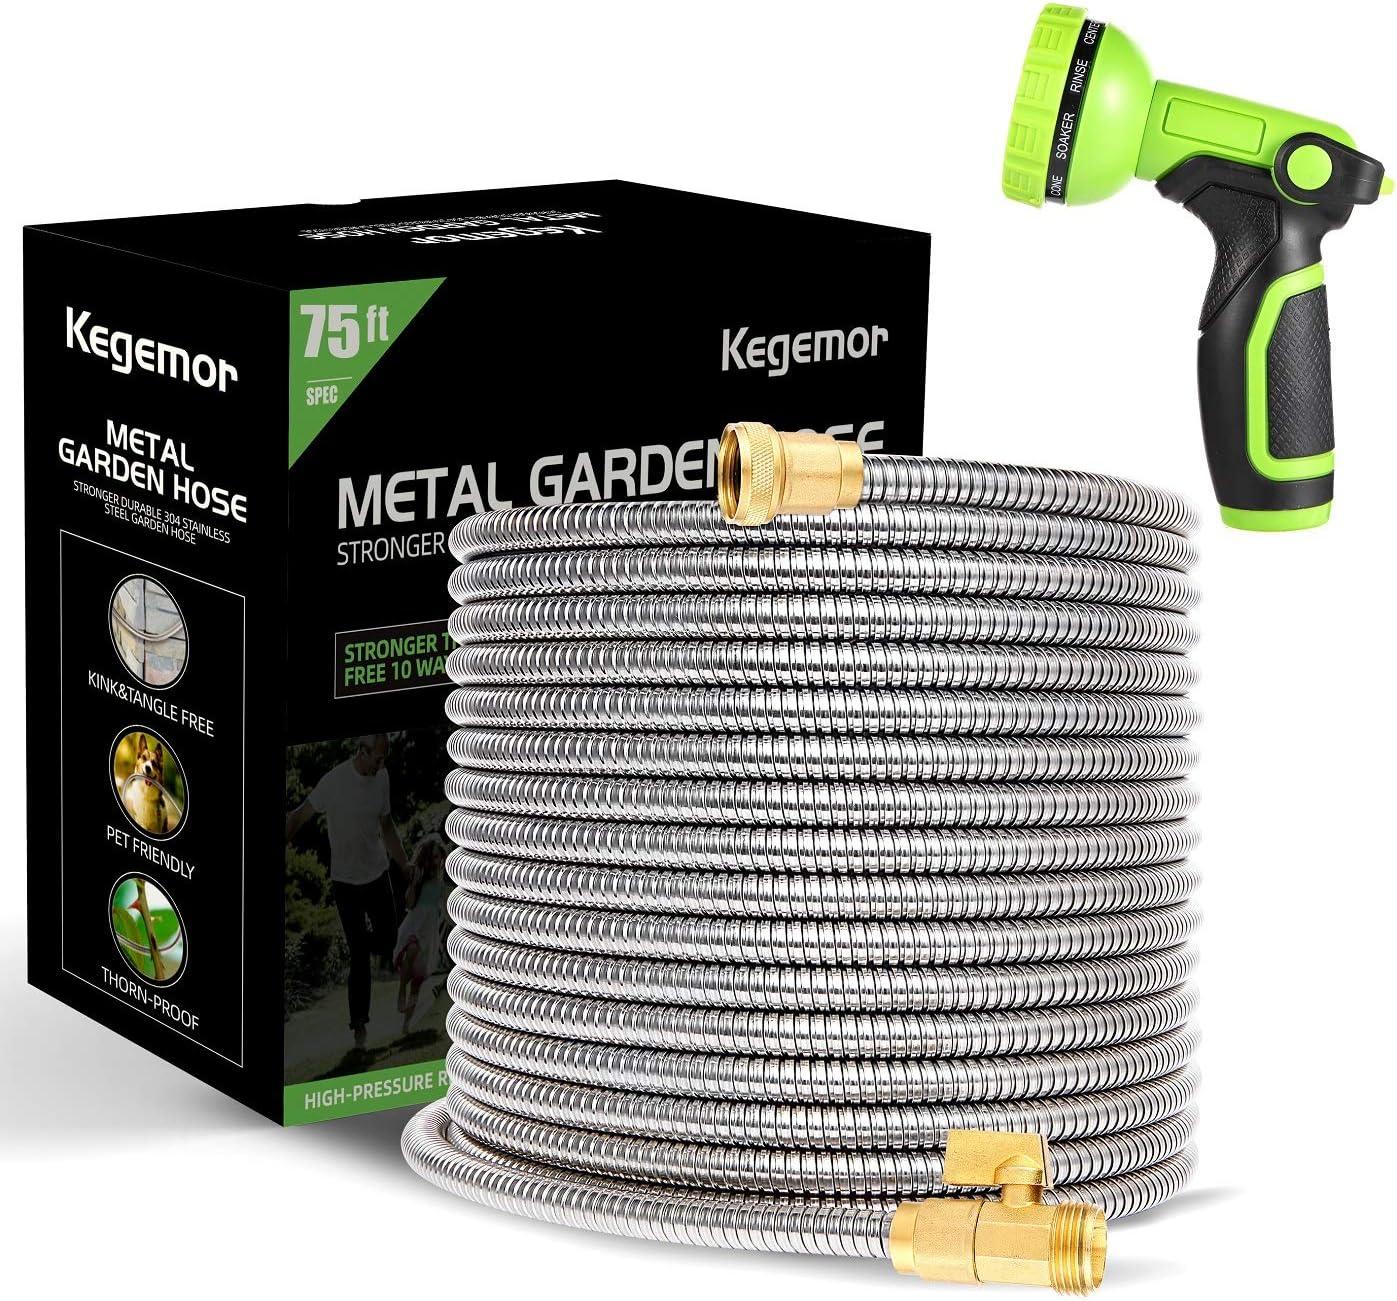 kegemor 70% OFF Outlet Garden Hose 75 Excellent Lightweight ft-Metal Water -Flexible